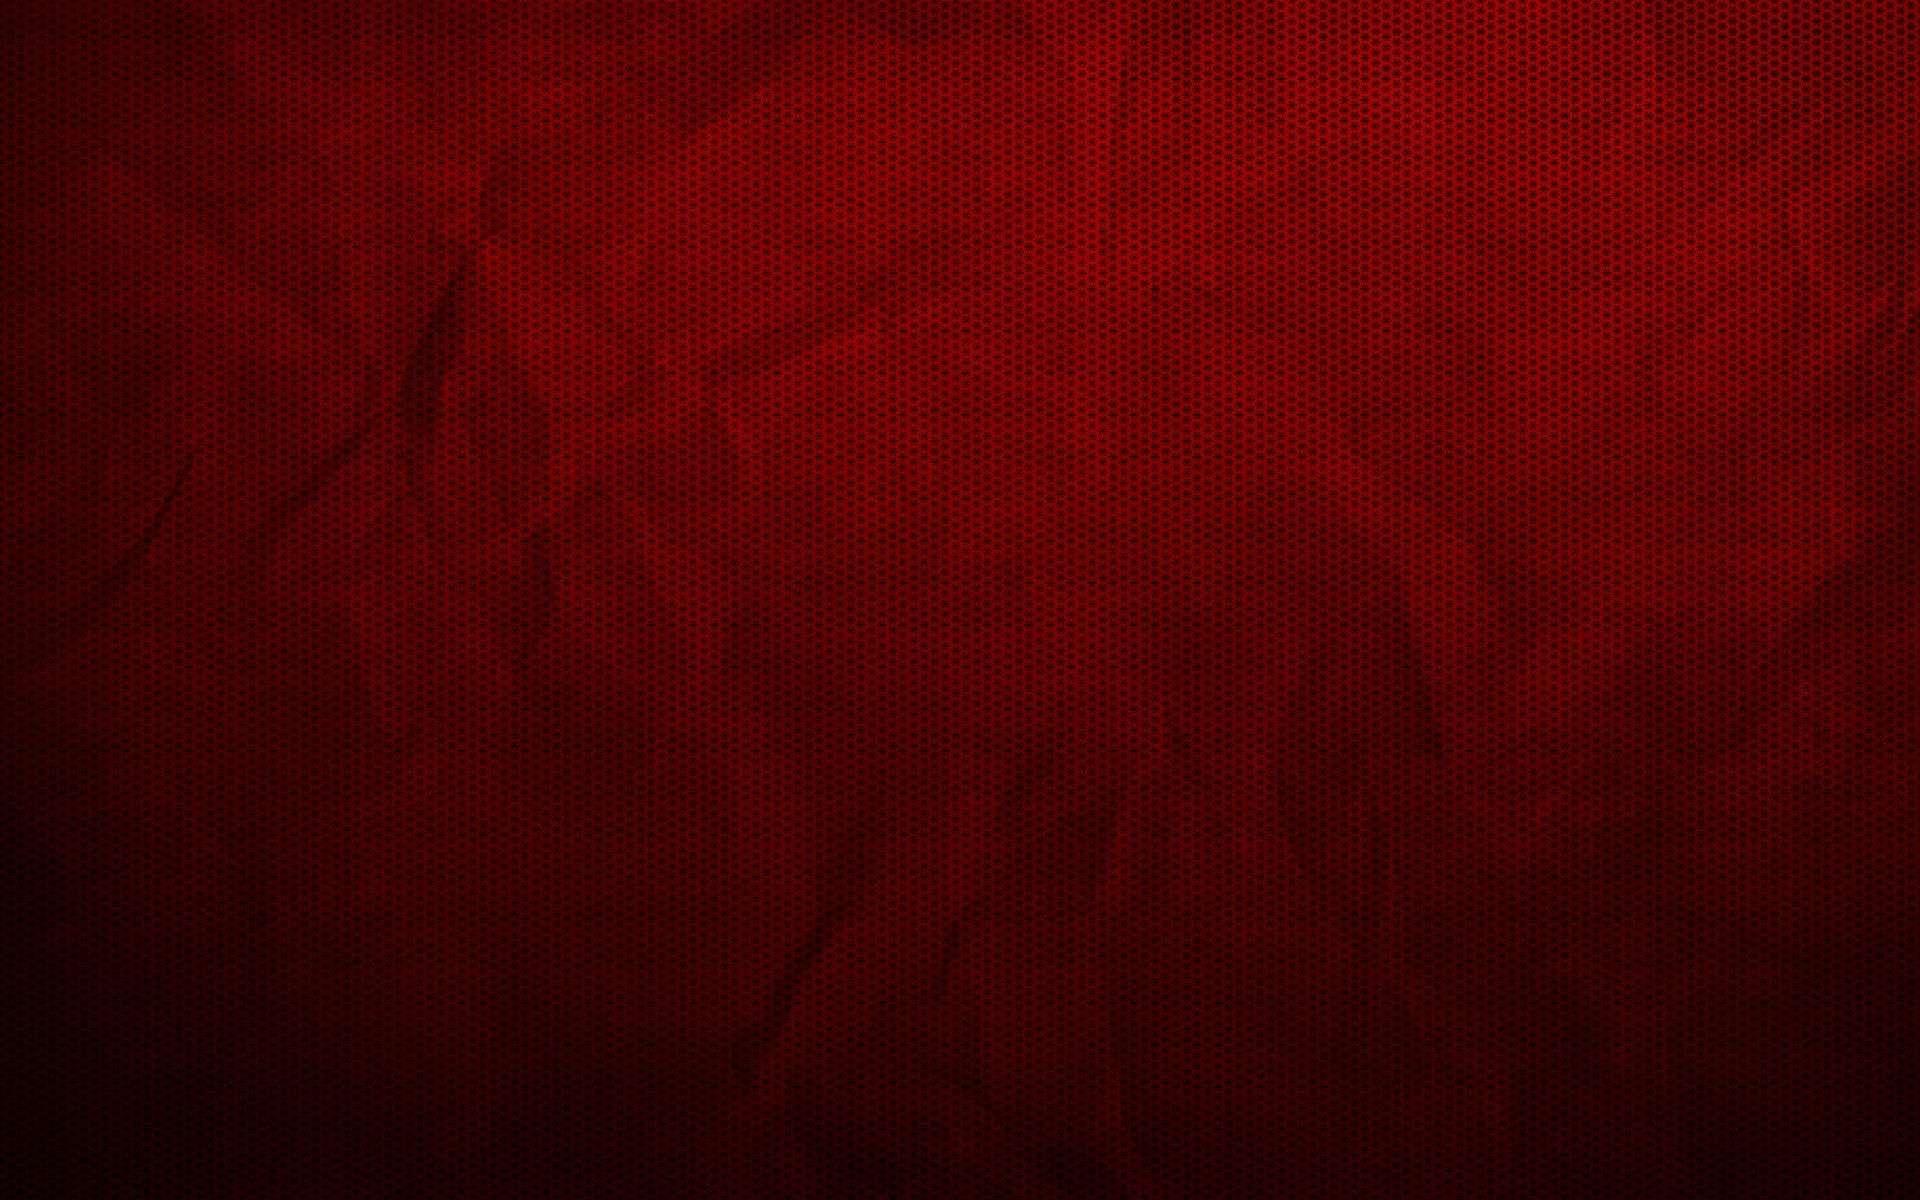 Red Wallpaper 055